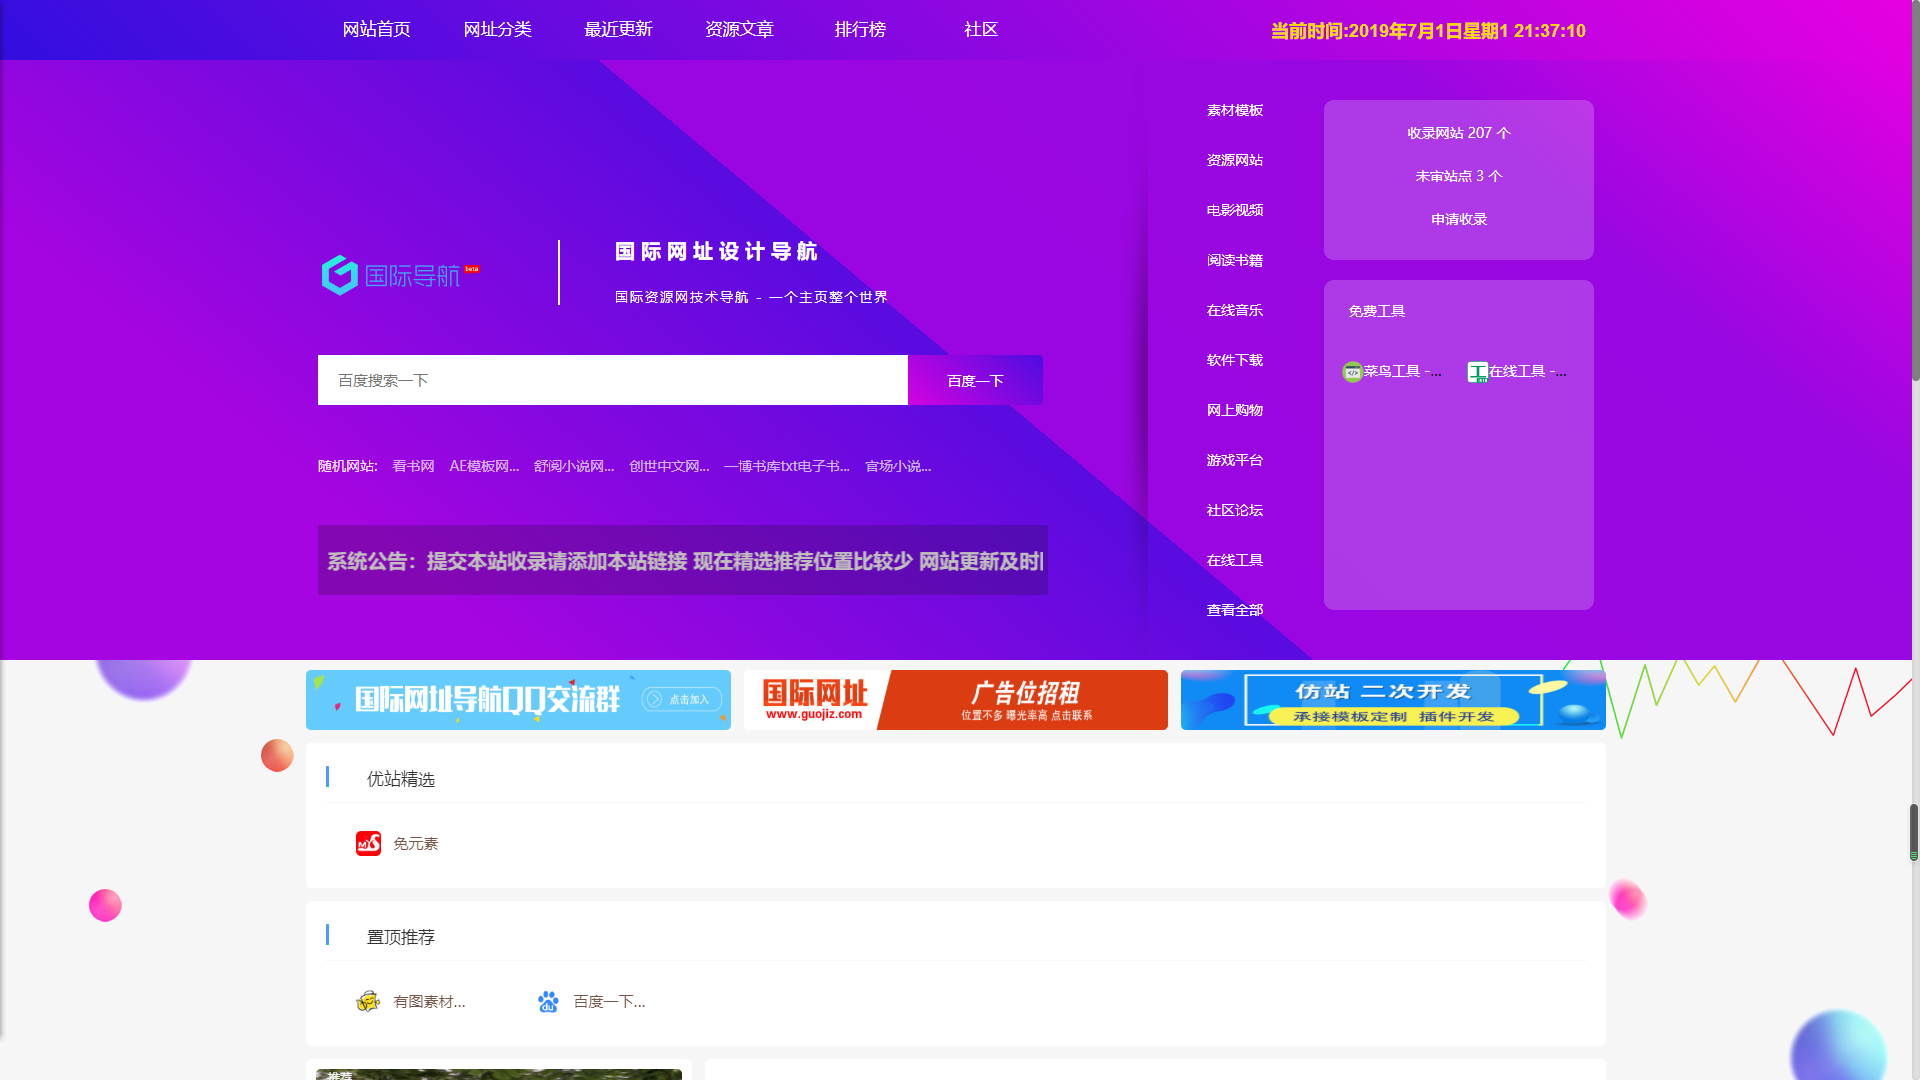 Guojiz网址导航系统V2.3正式版 - 全新发布-资源客